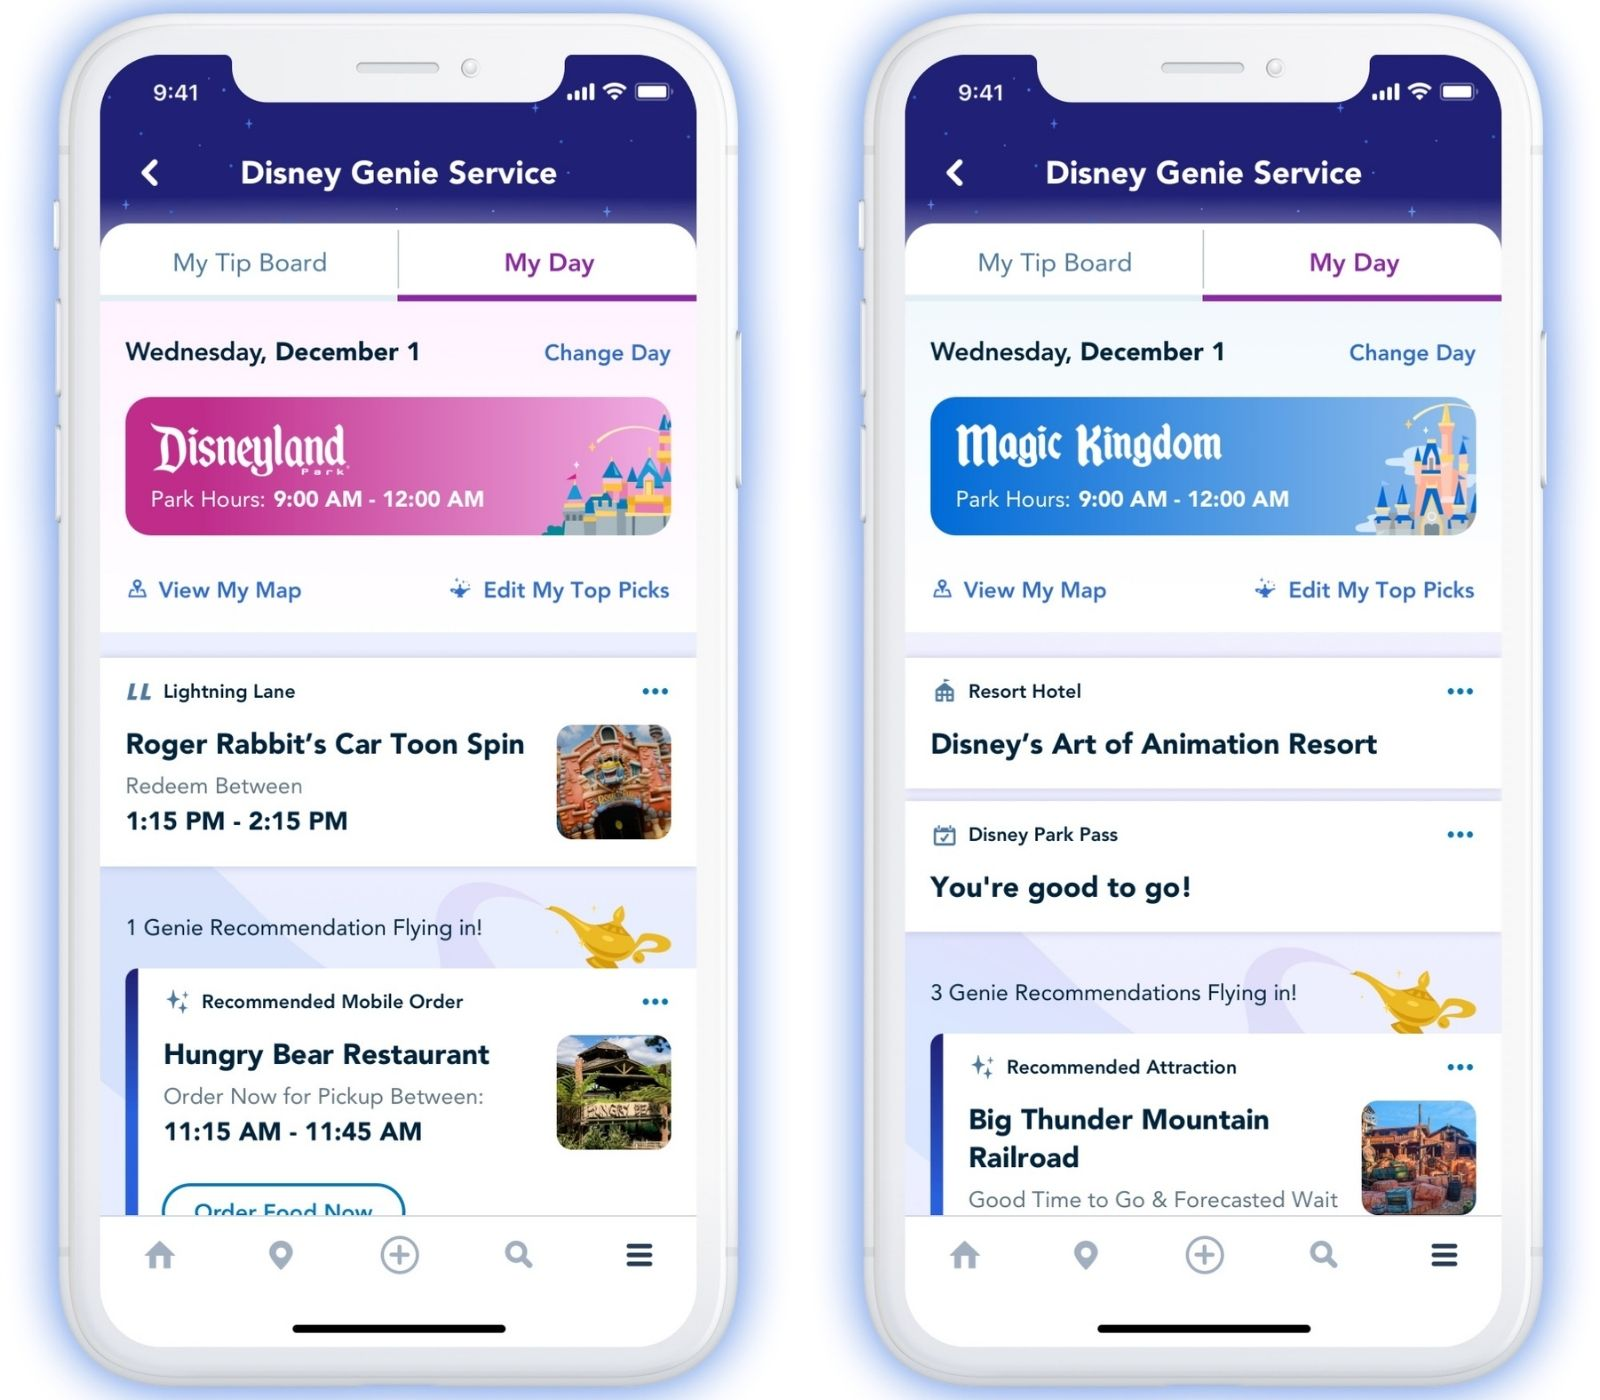 Disney Genie screenshots for disneyland and disney world daily plans